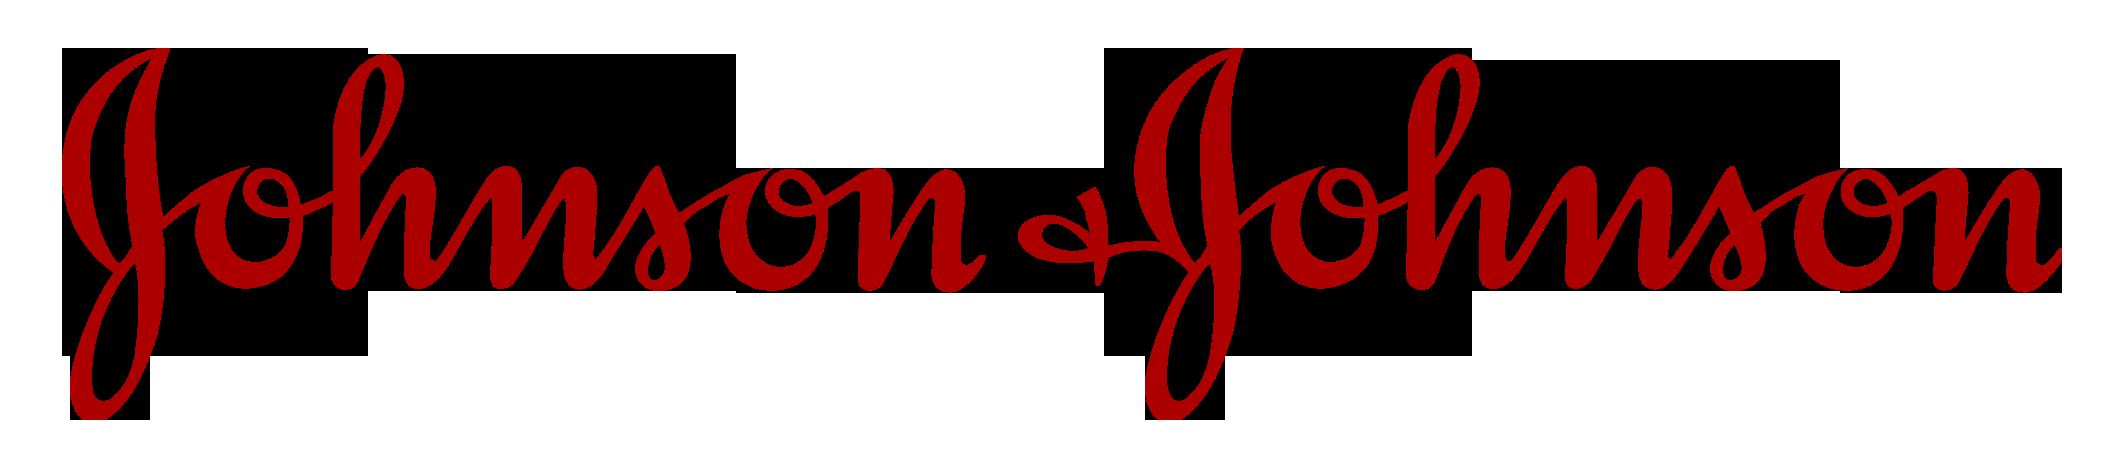 Johnson & Johns Logo